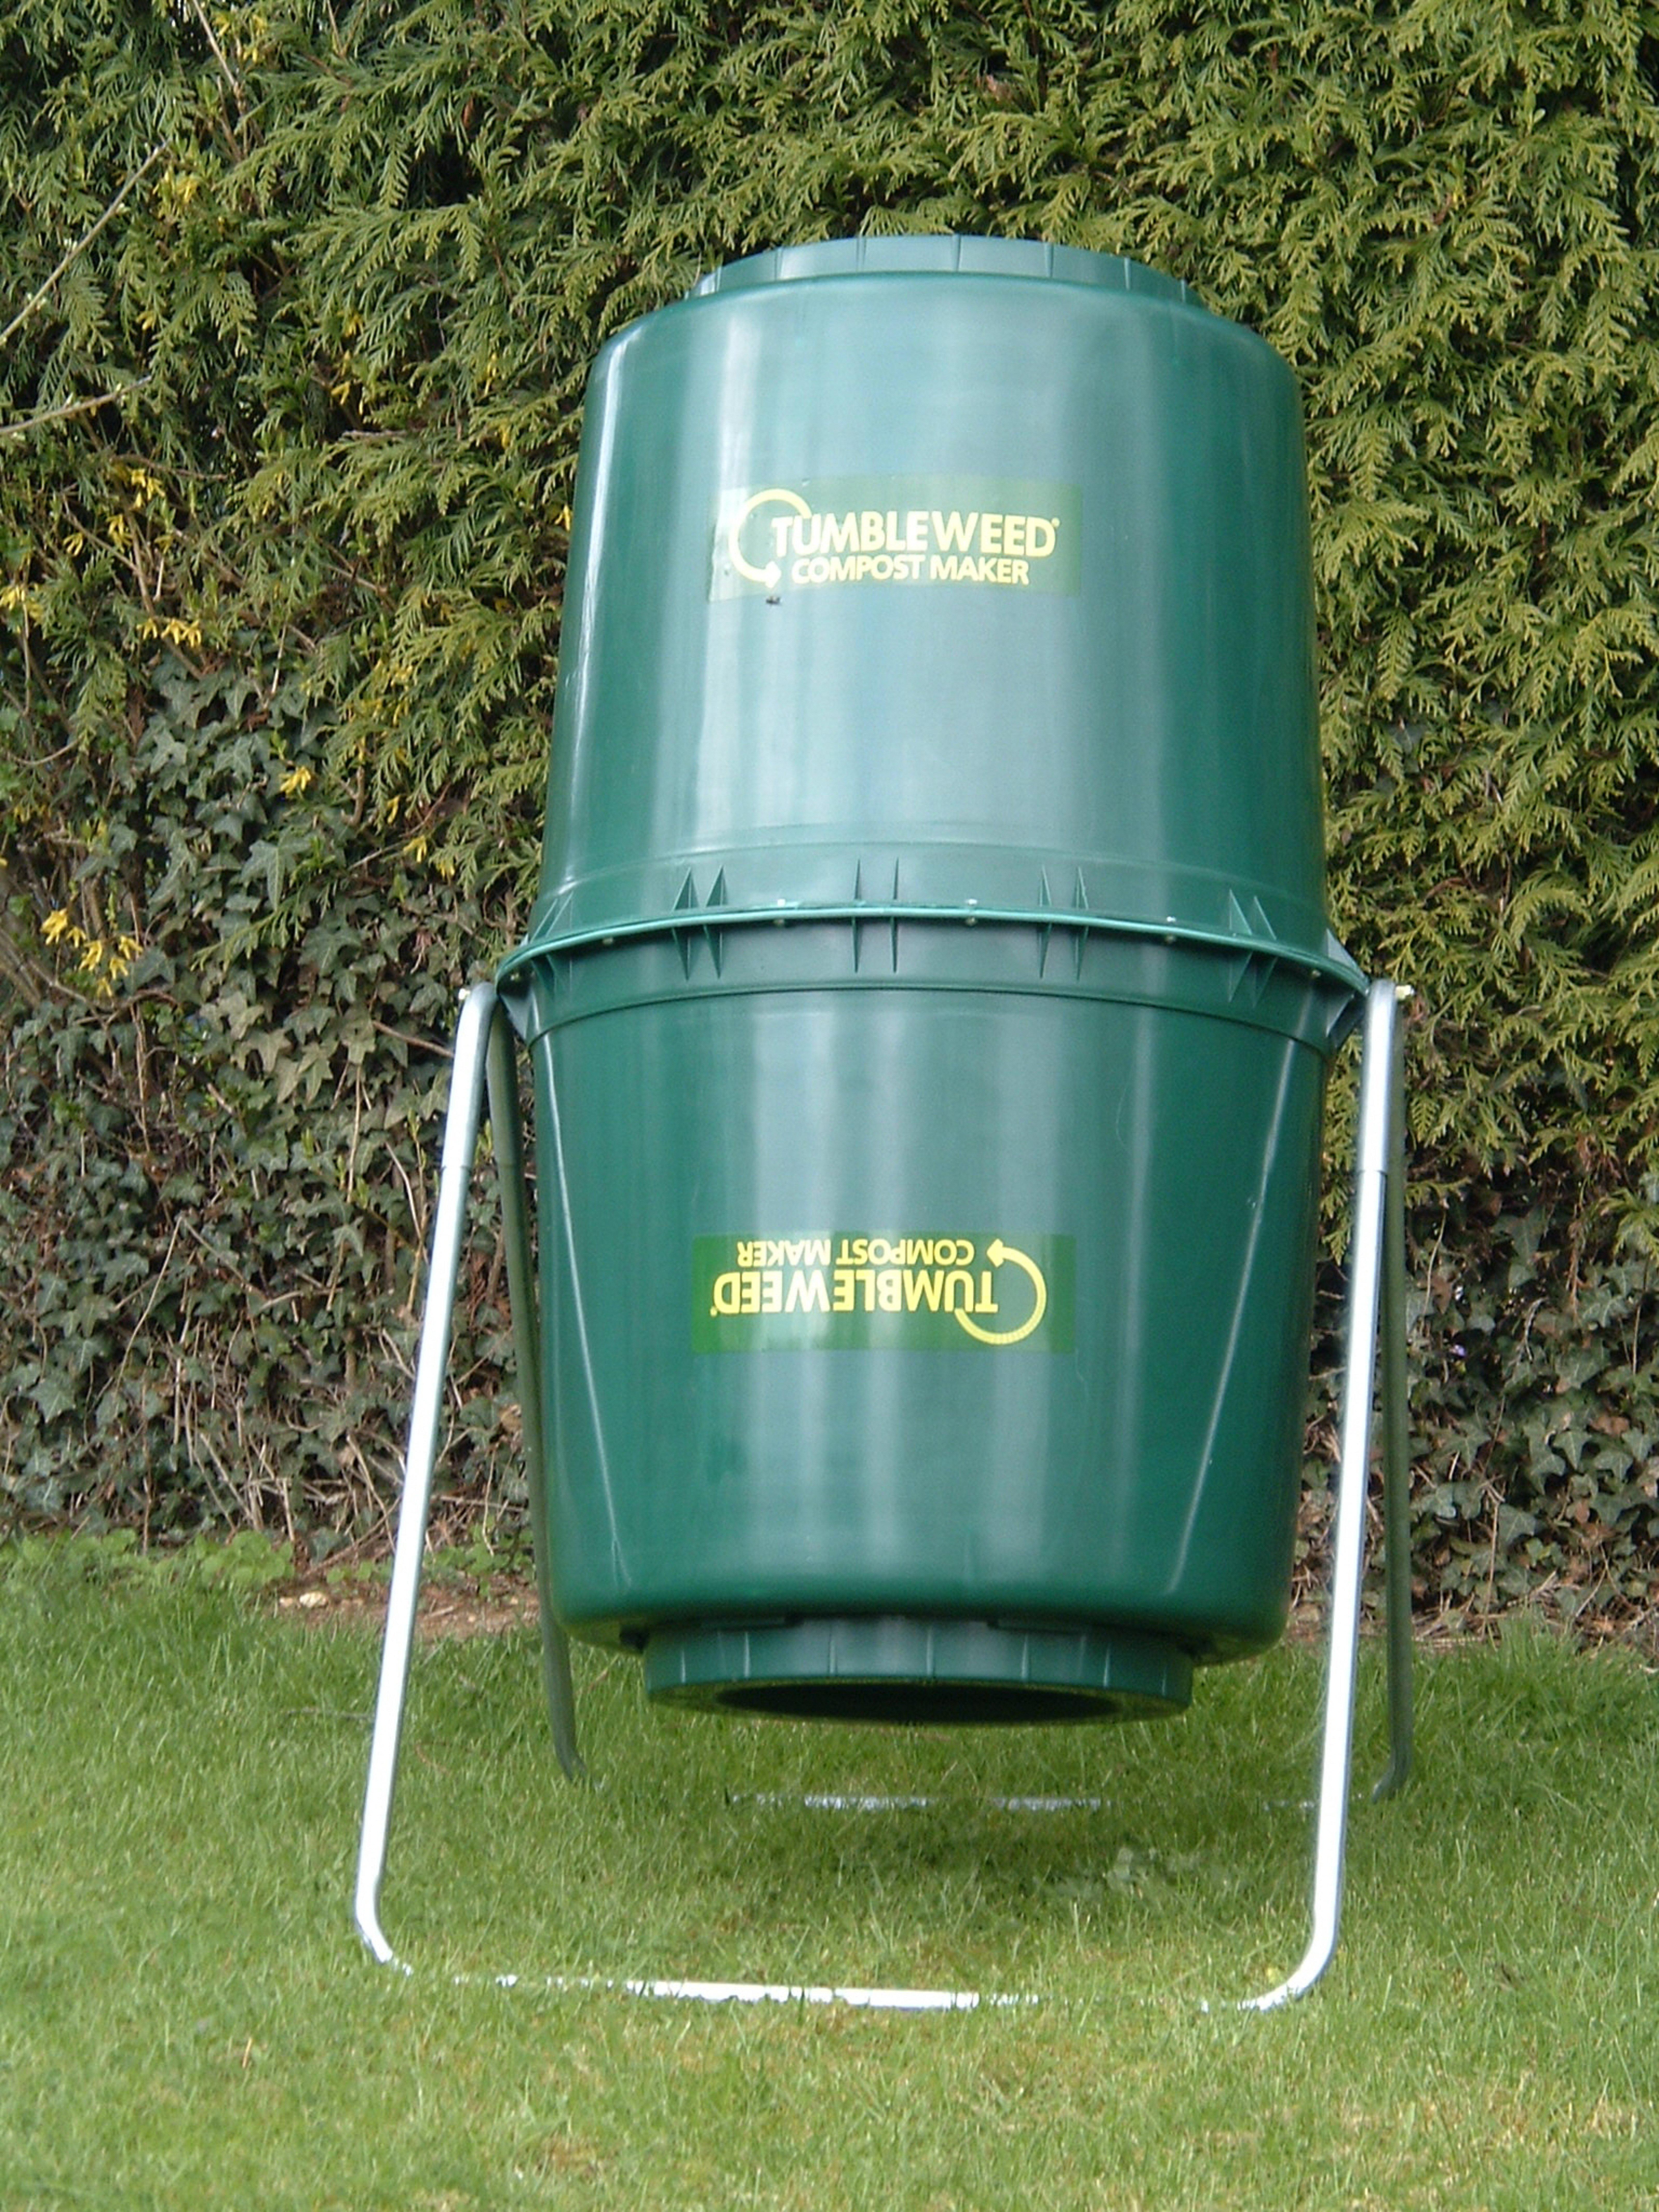 Green tumbleweed compost bin